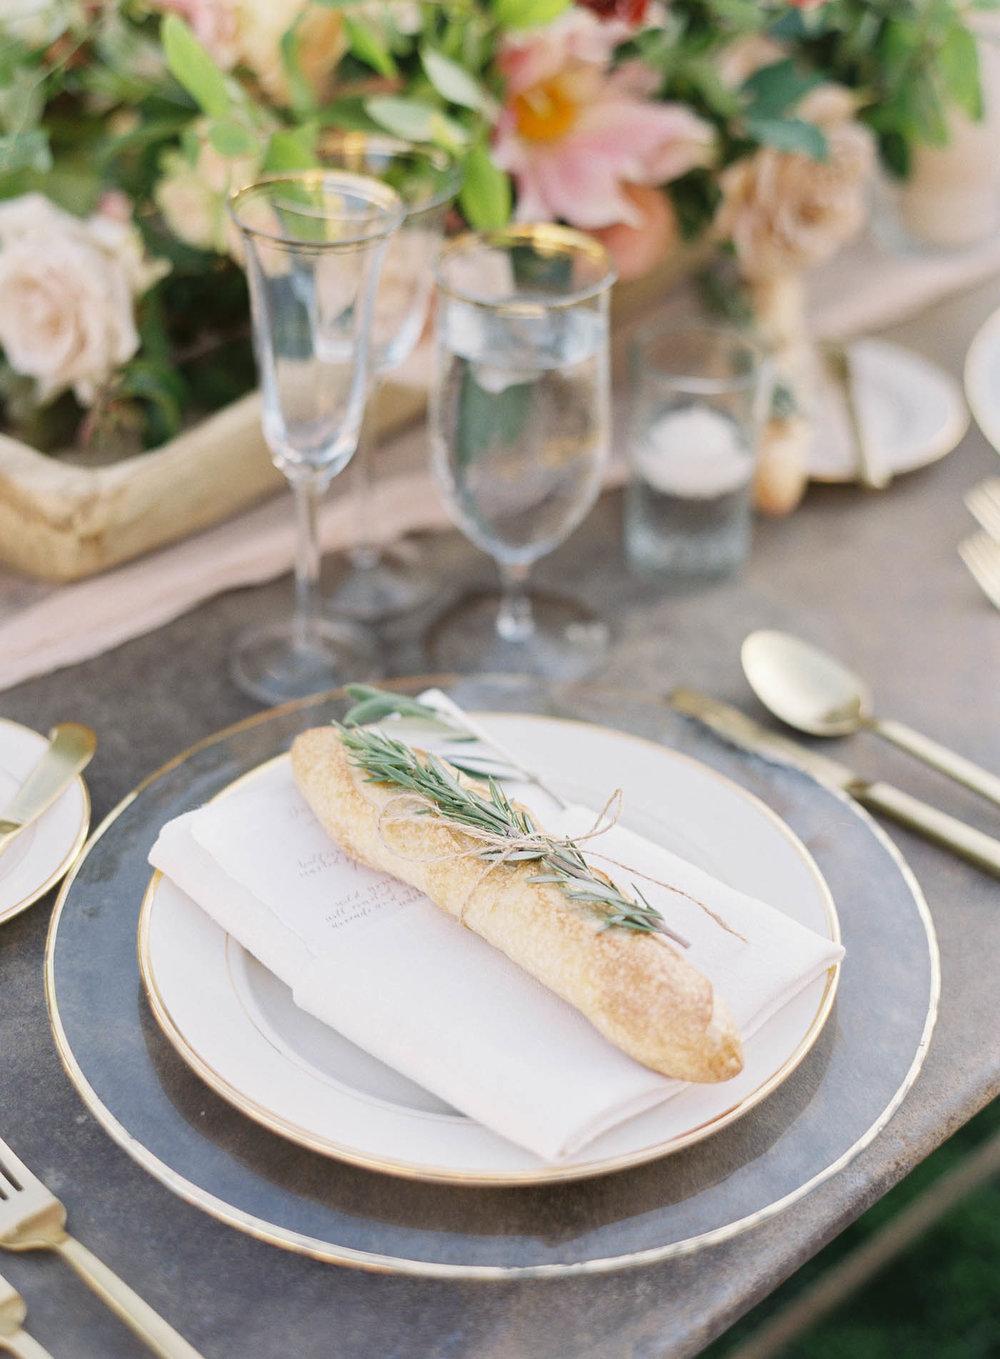 sunstone-villa-wedding-34-Jen_Huang-RD-161-Jen_Huang-009584-R1-016.jpg